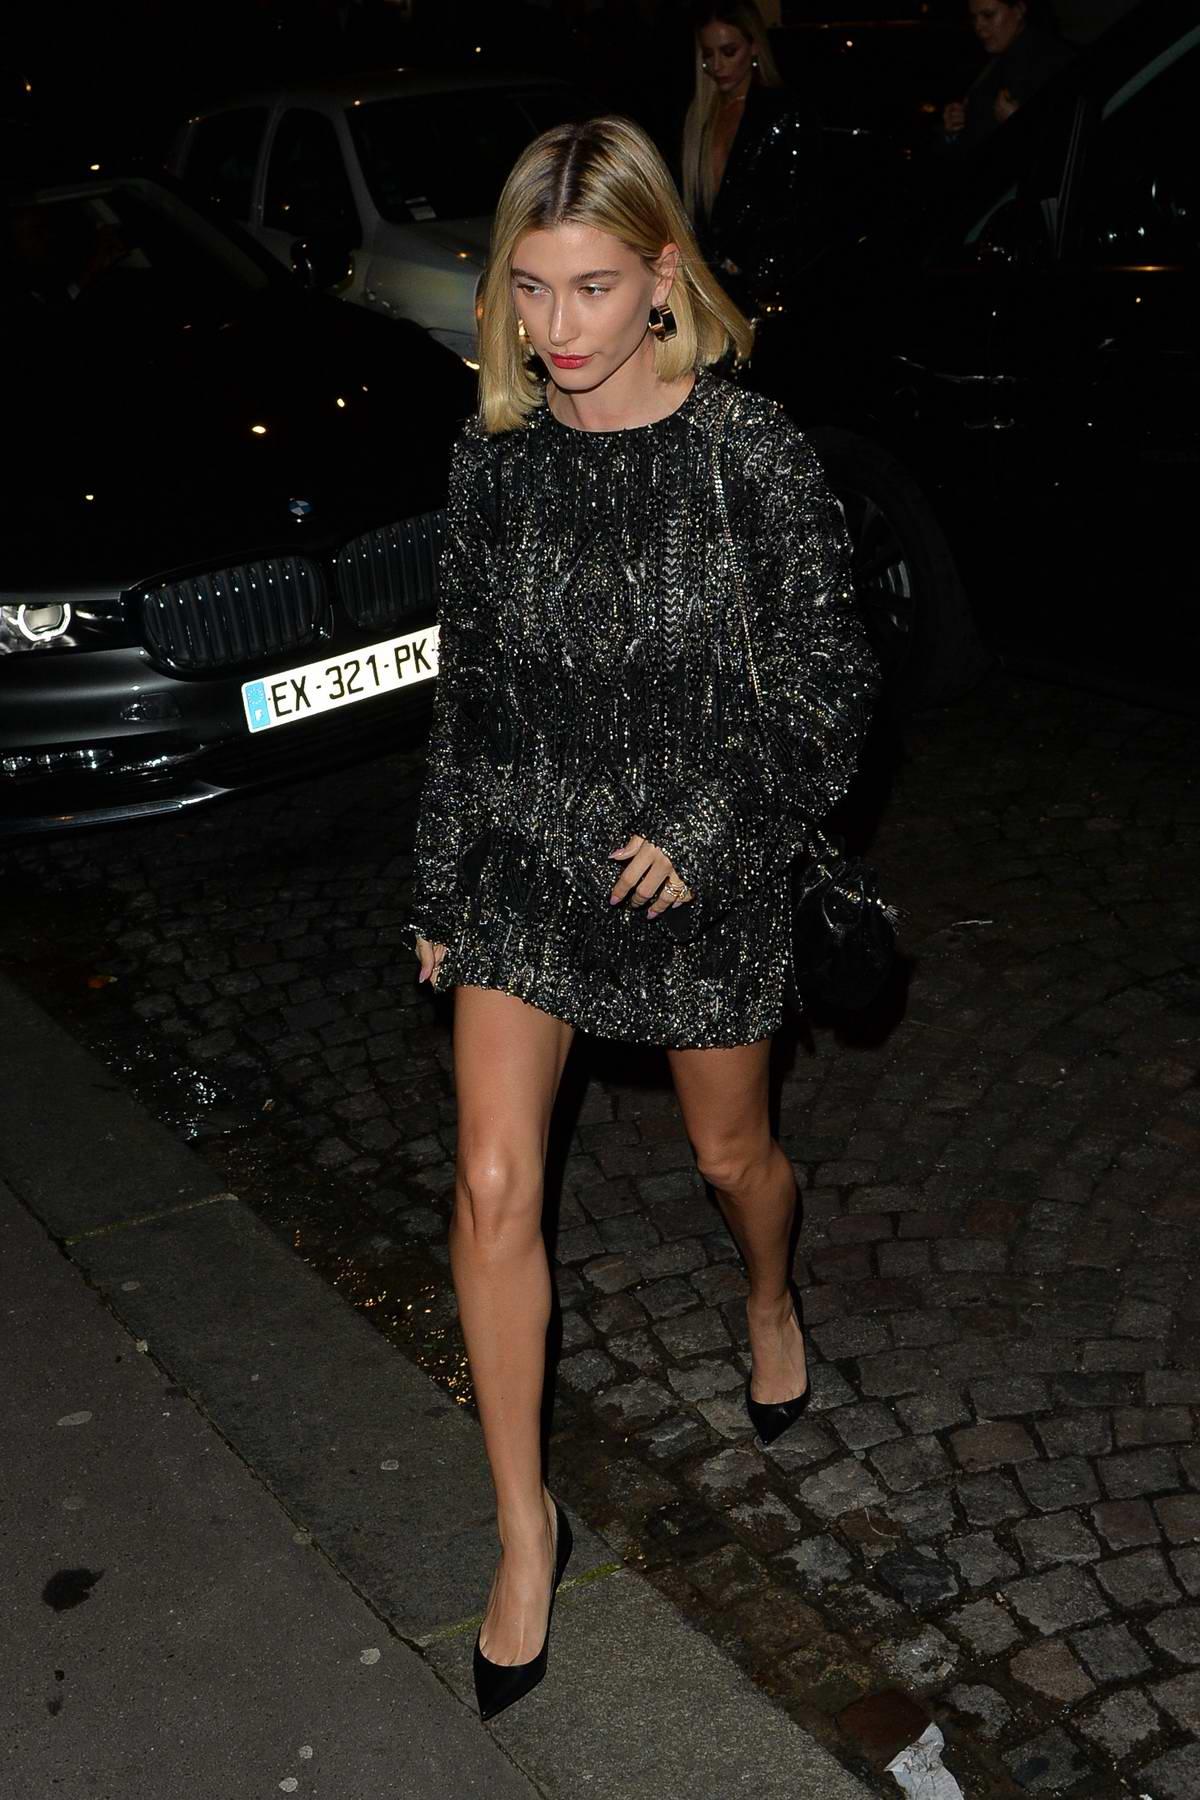 Hailey Bieber arrives at the Saint Laurent dinner party in Paris, France